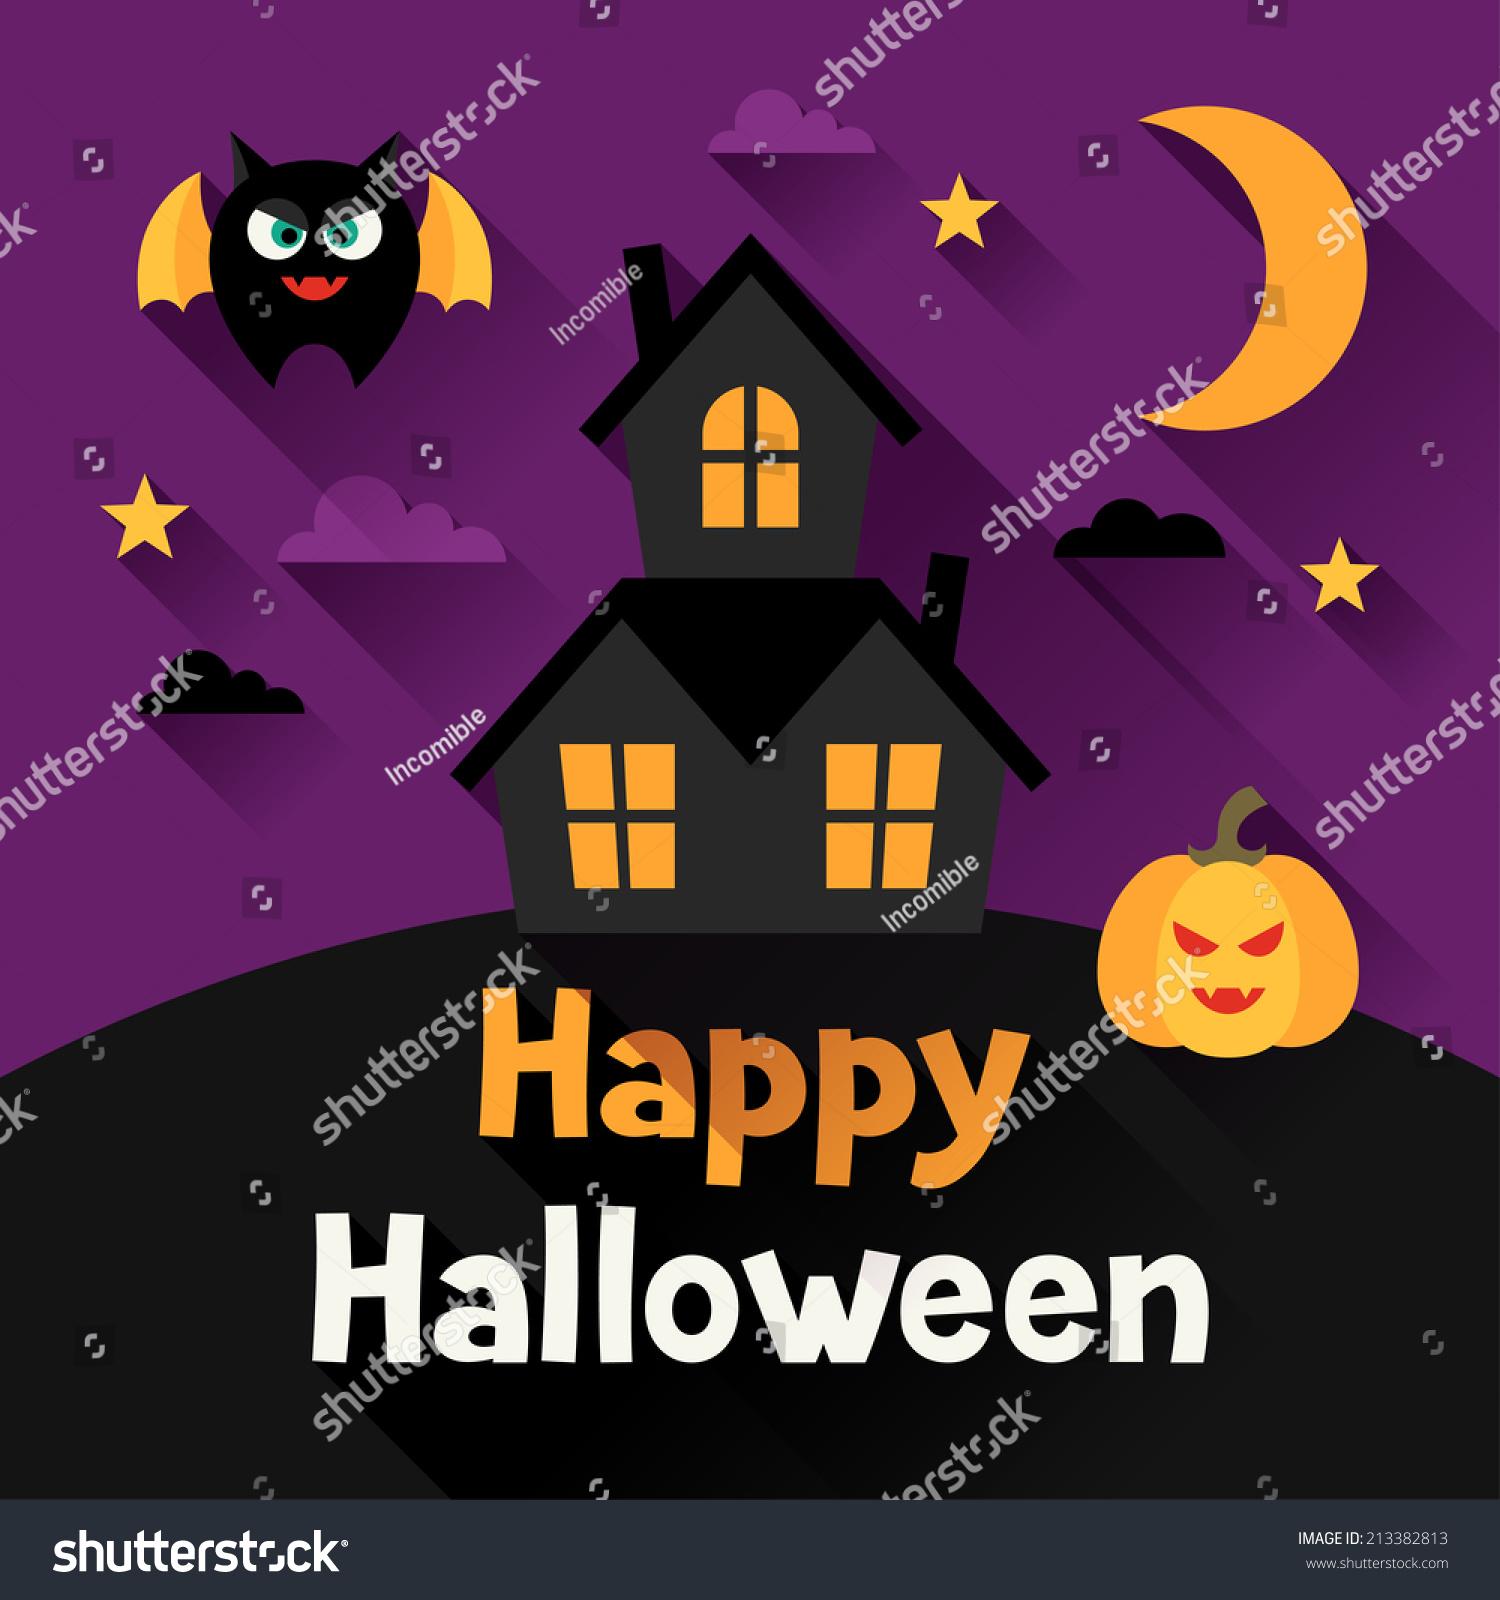 Happy Halloween Greeting Card Flat Design Stock Vector Royalty Free